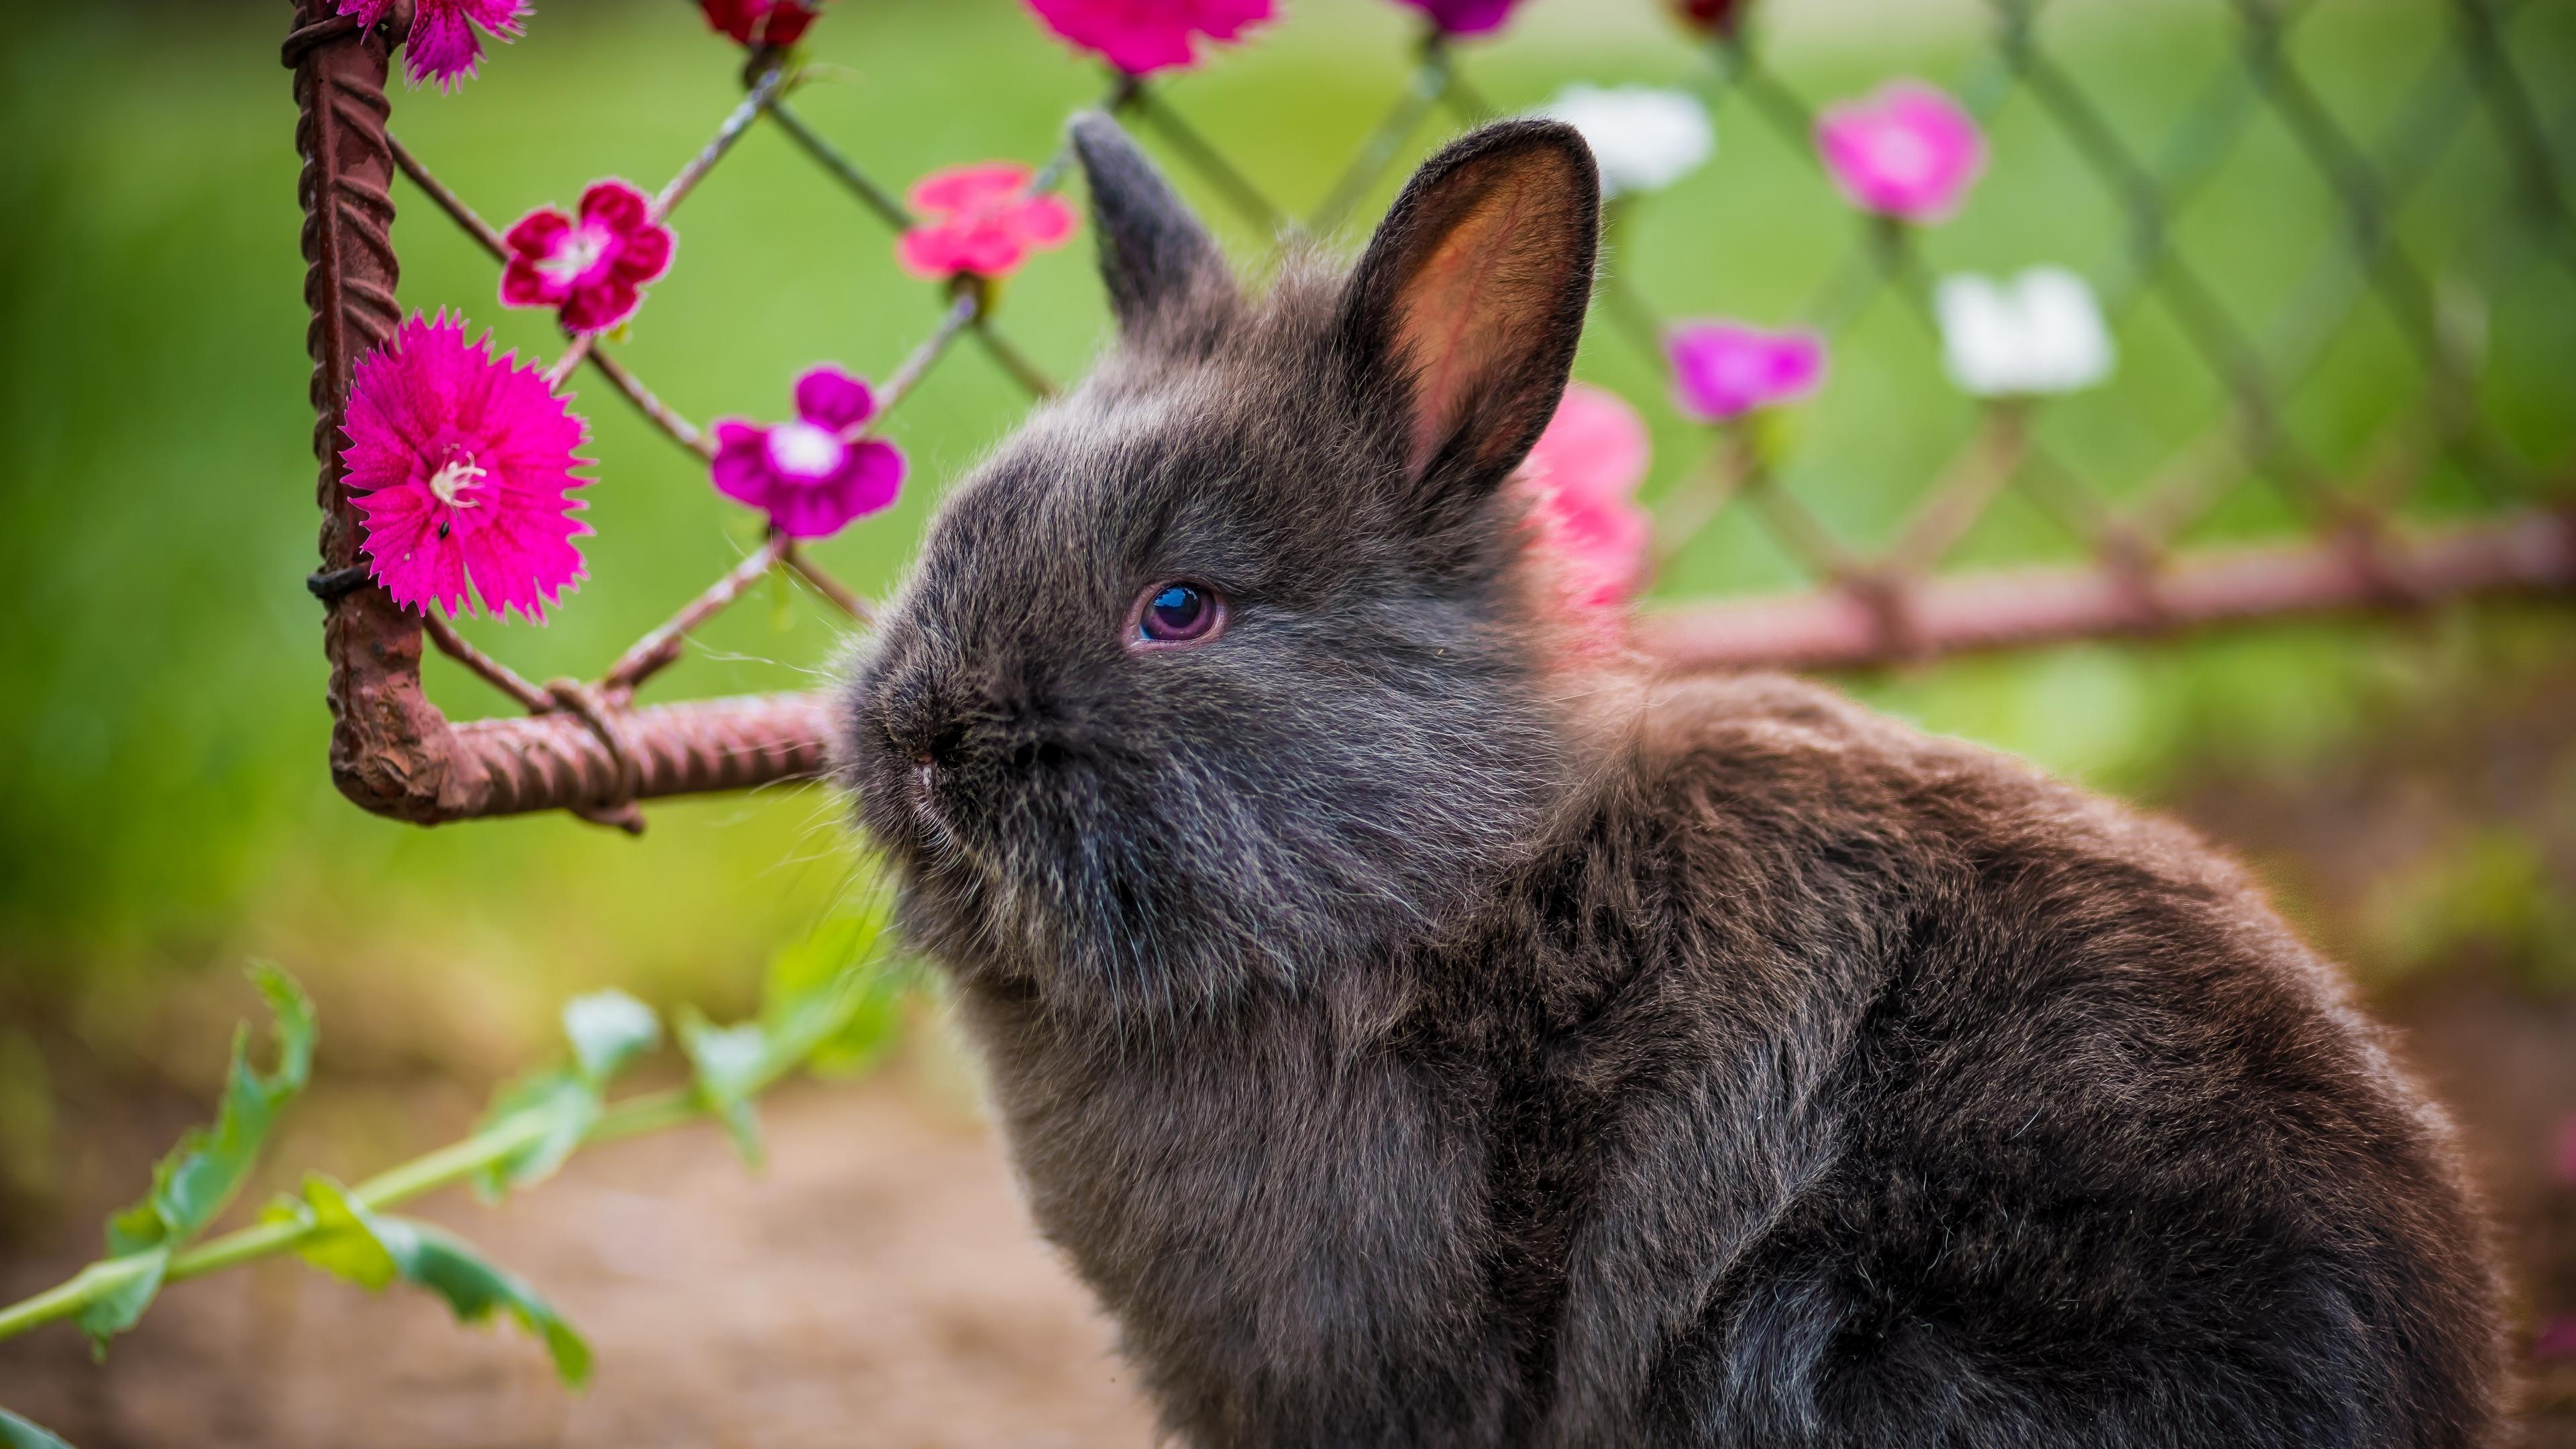 rabbit fluffy flowers 4k 1542241404 - rabbit, fluffy, flowers 4k - Rabbit, fluffy, Flowers